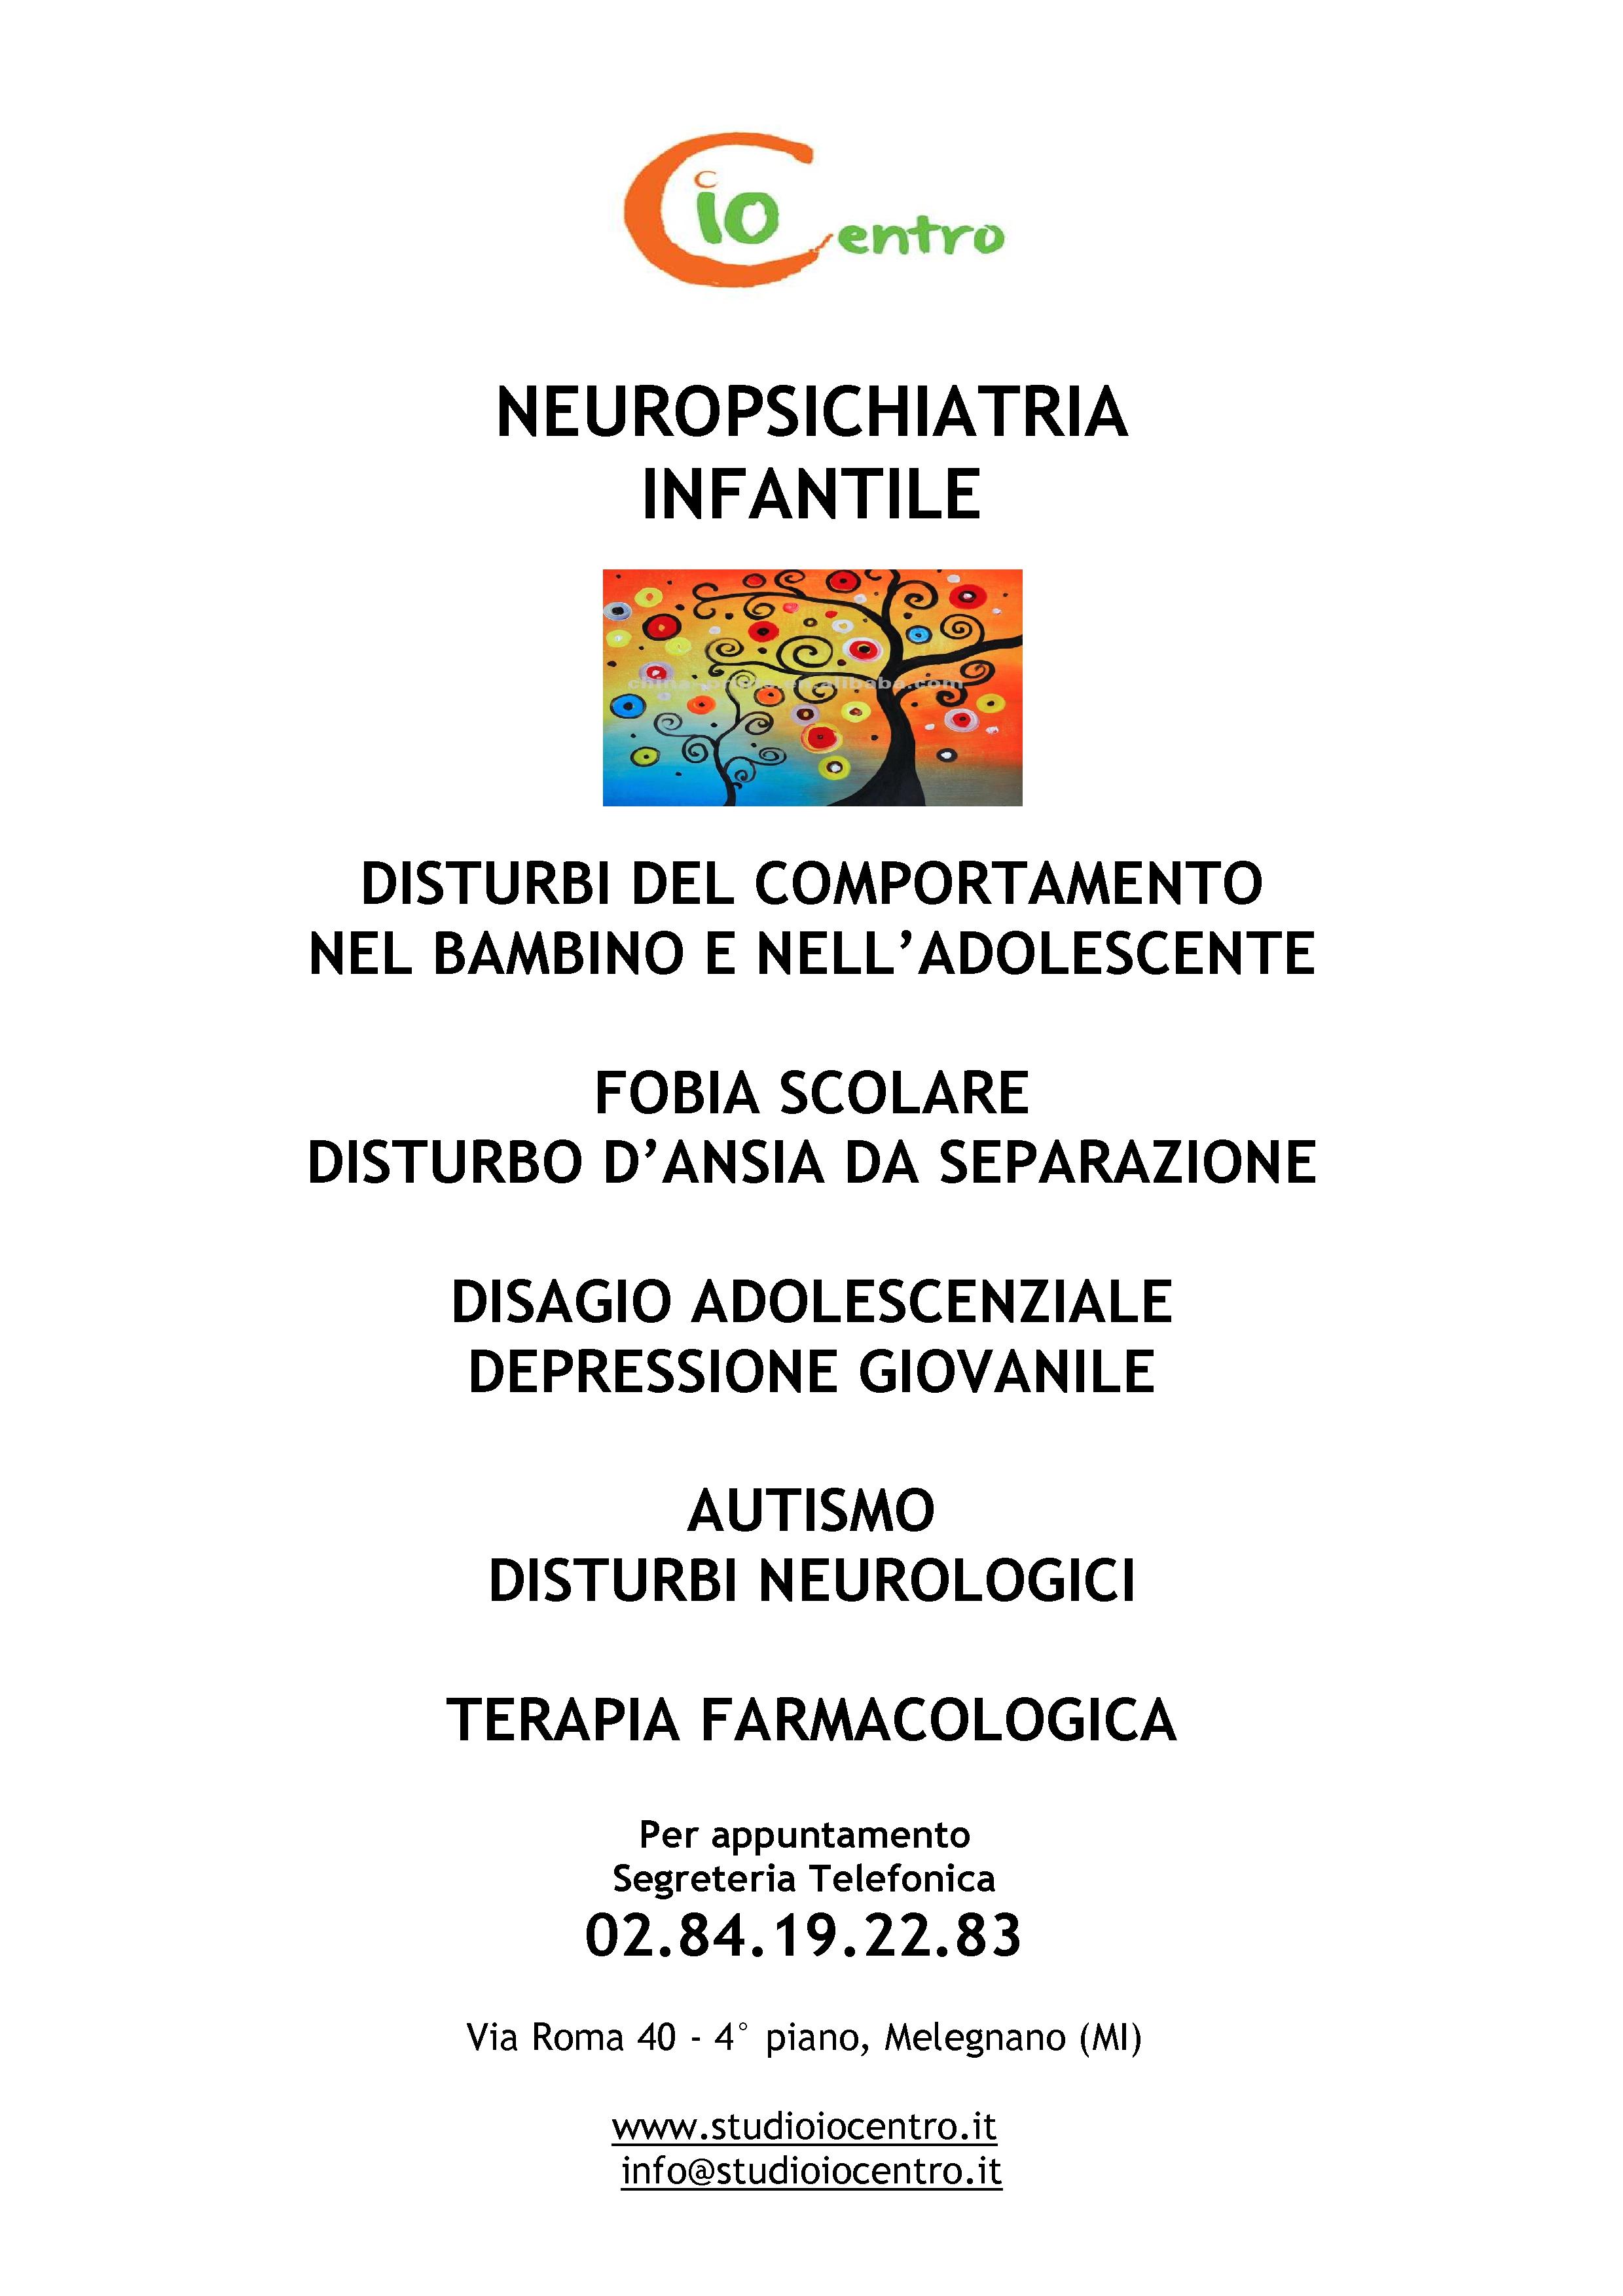 UNICO NEUROPSICHIATRIA